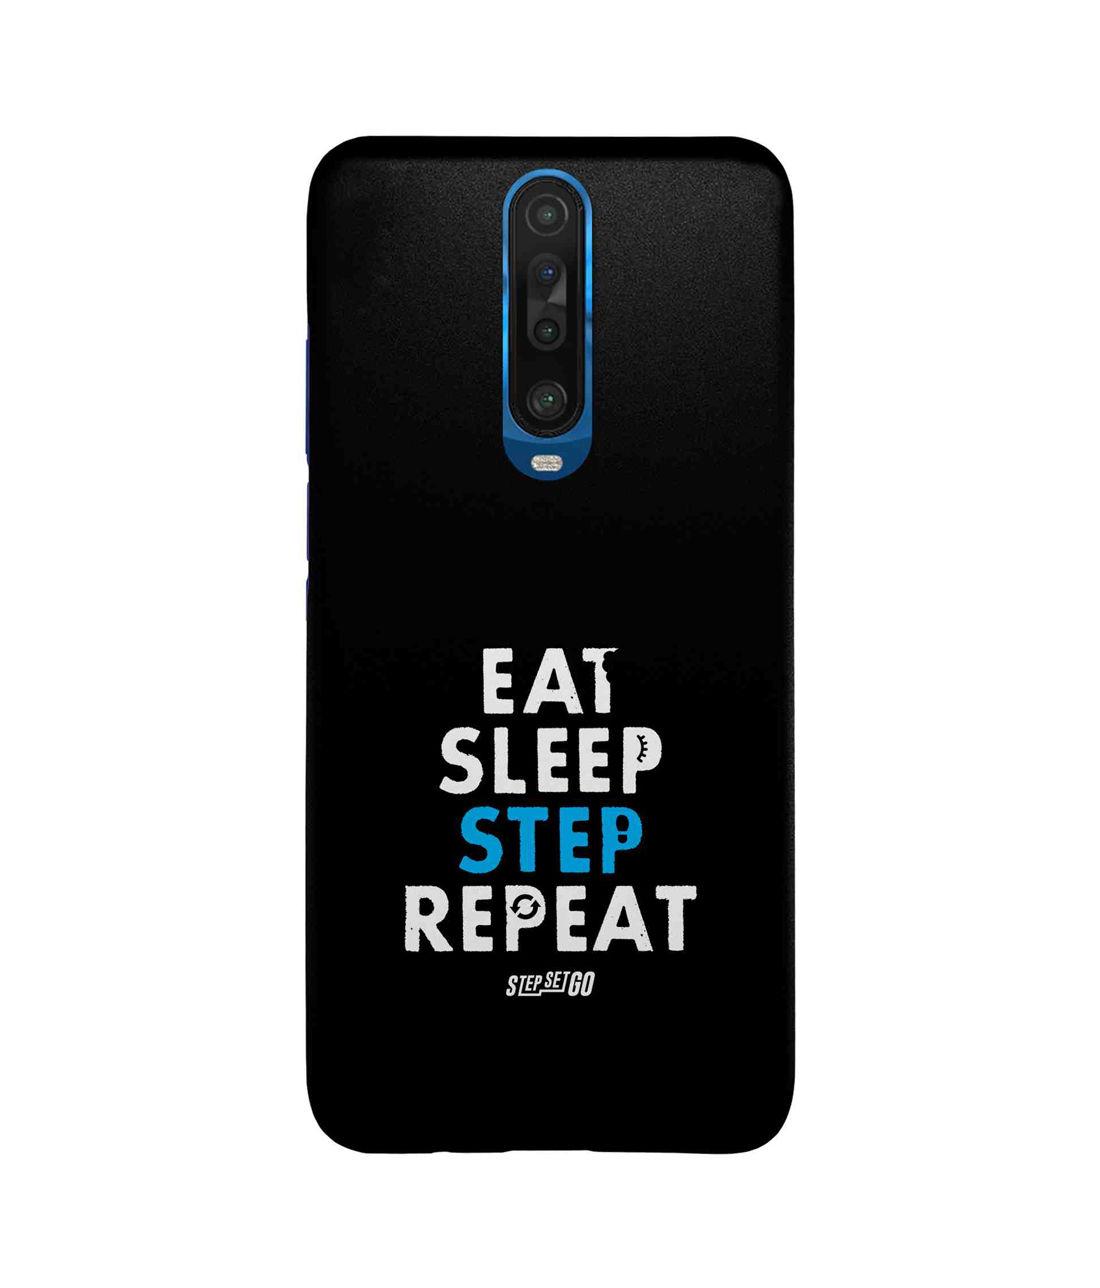 Eat Sleep Step Repeat - Sleek Case for Xiaomi Poco X2